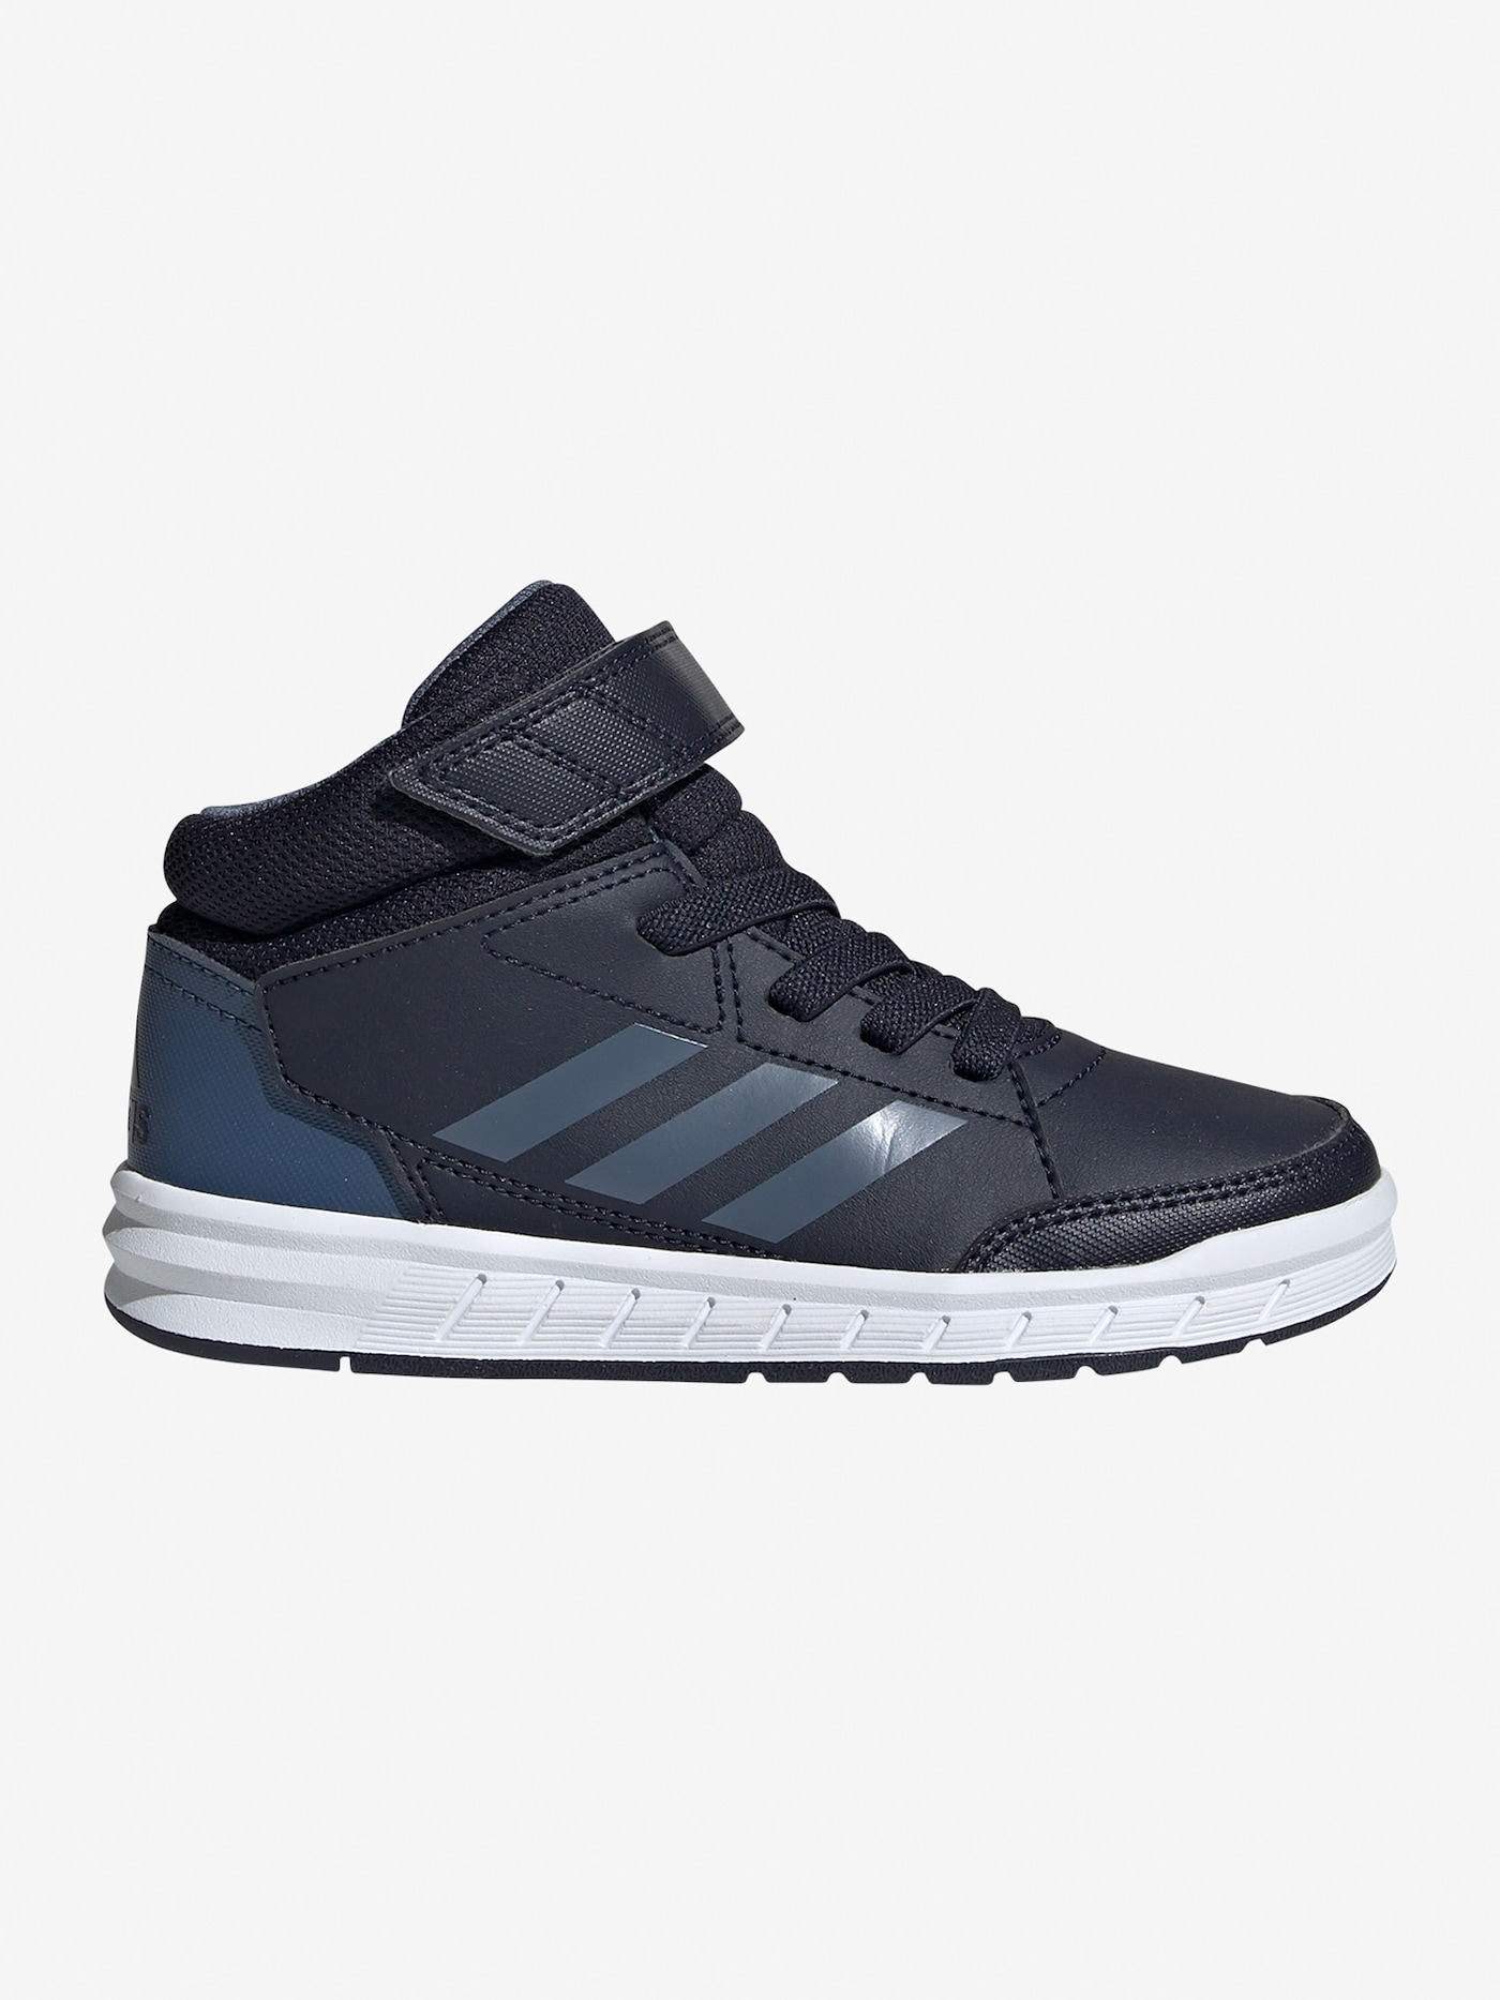 Adidas Performance Altasport Mid K Shoes